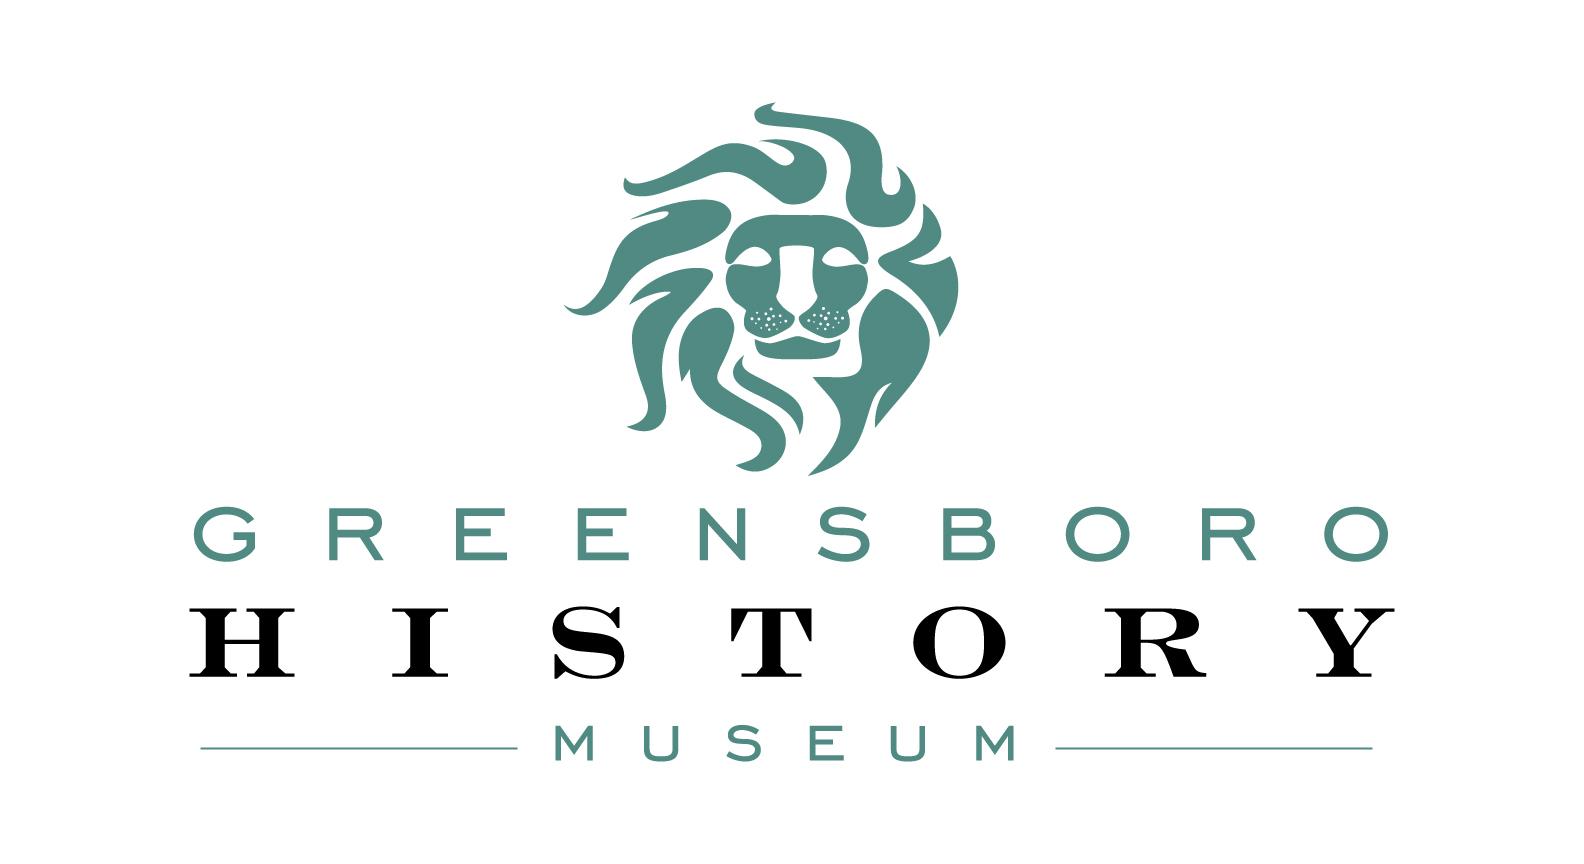 Greensboro History Museum logo